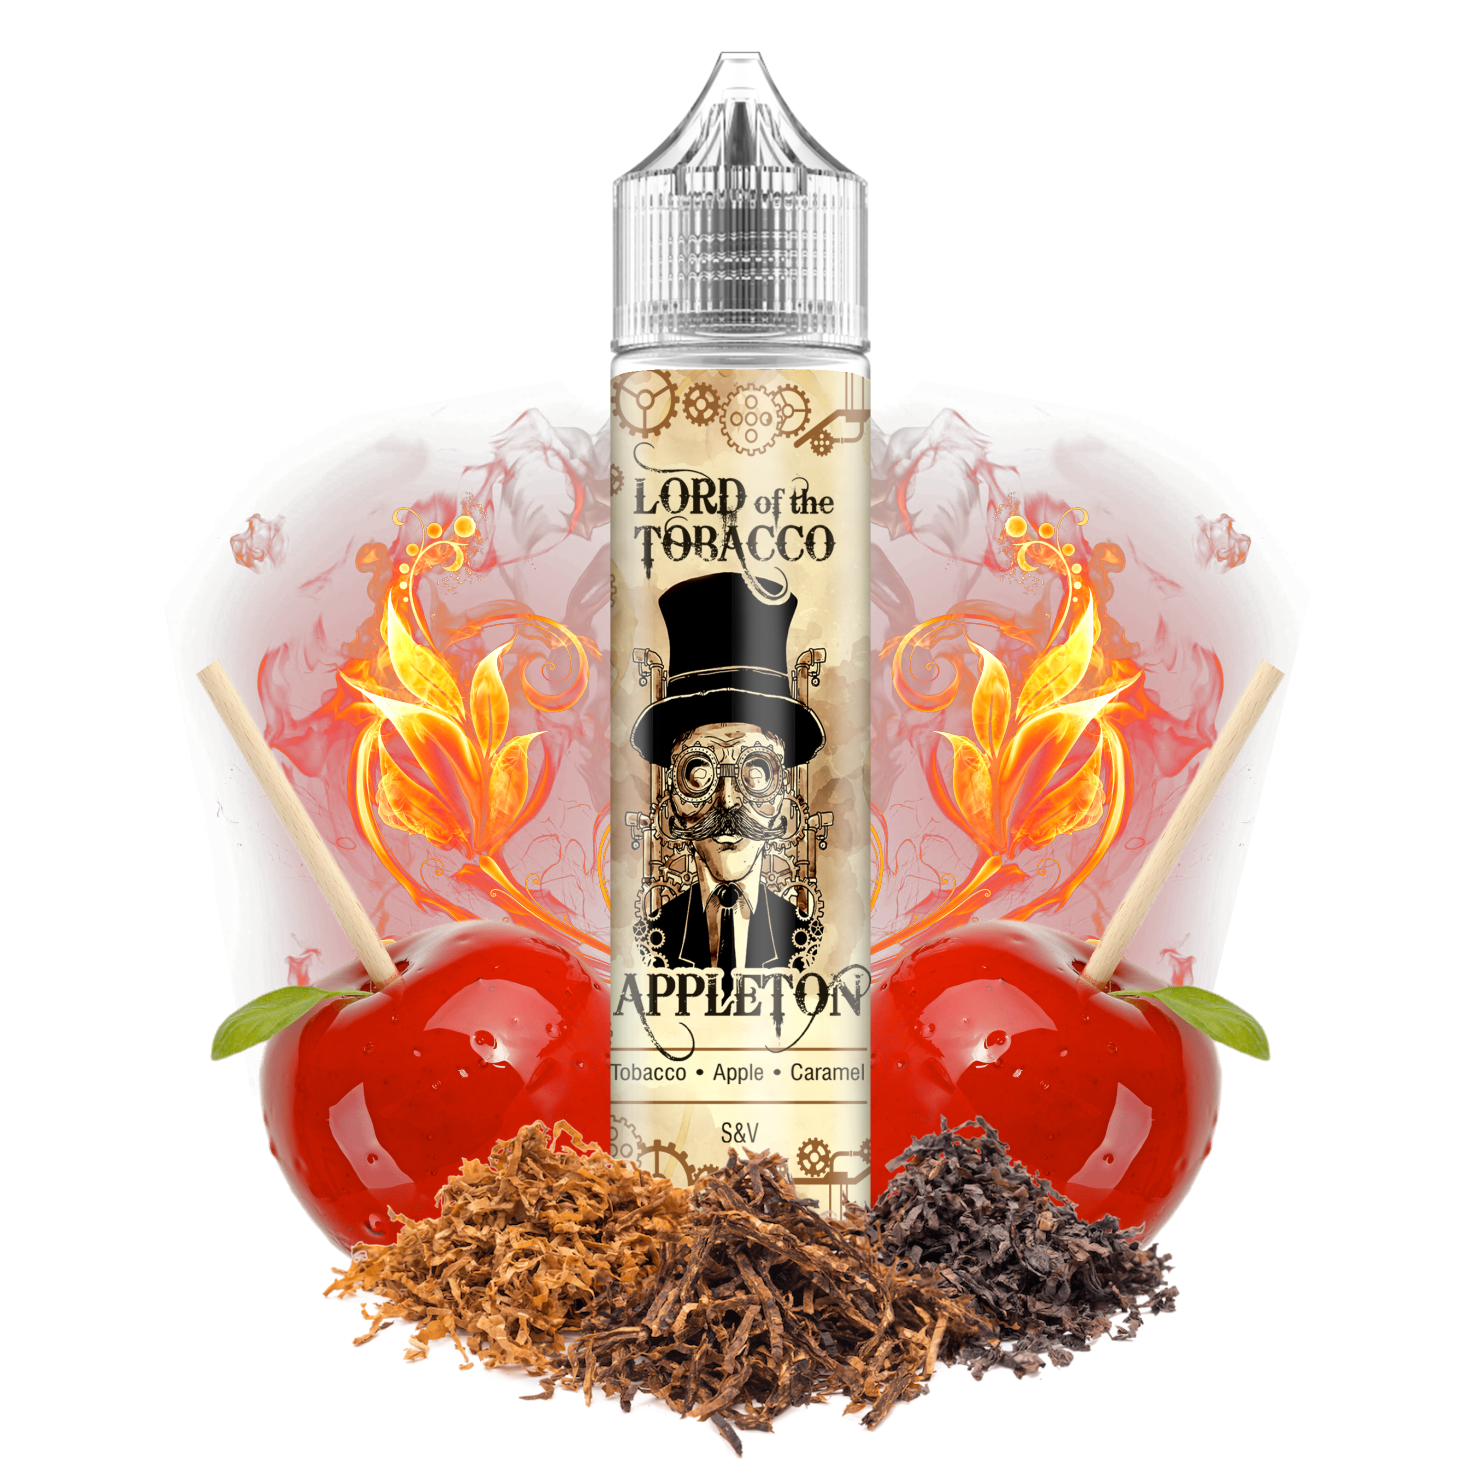 APPLETON / tabák, pečená jablka, karamel - Lord of the Tobacco shake&vape 12ml Dream Flavor